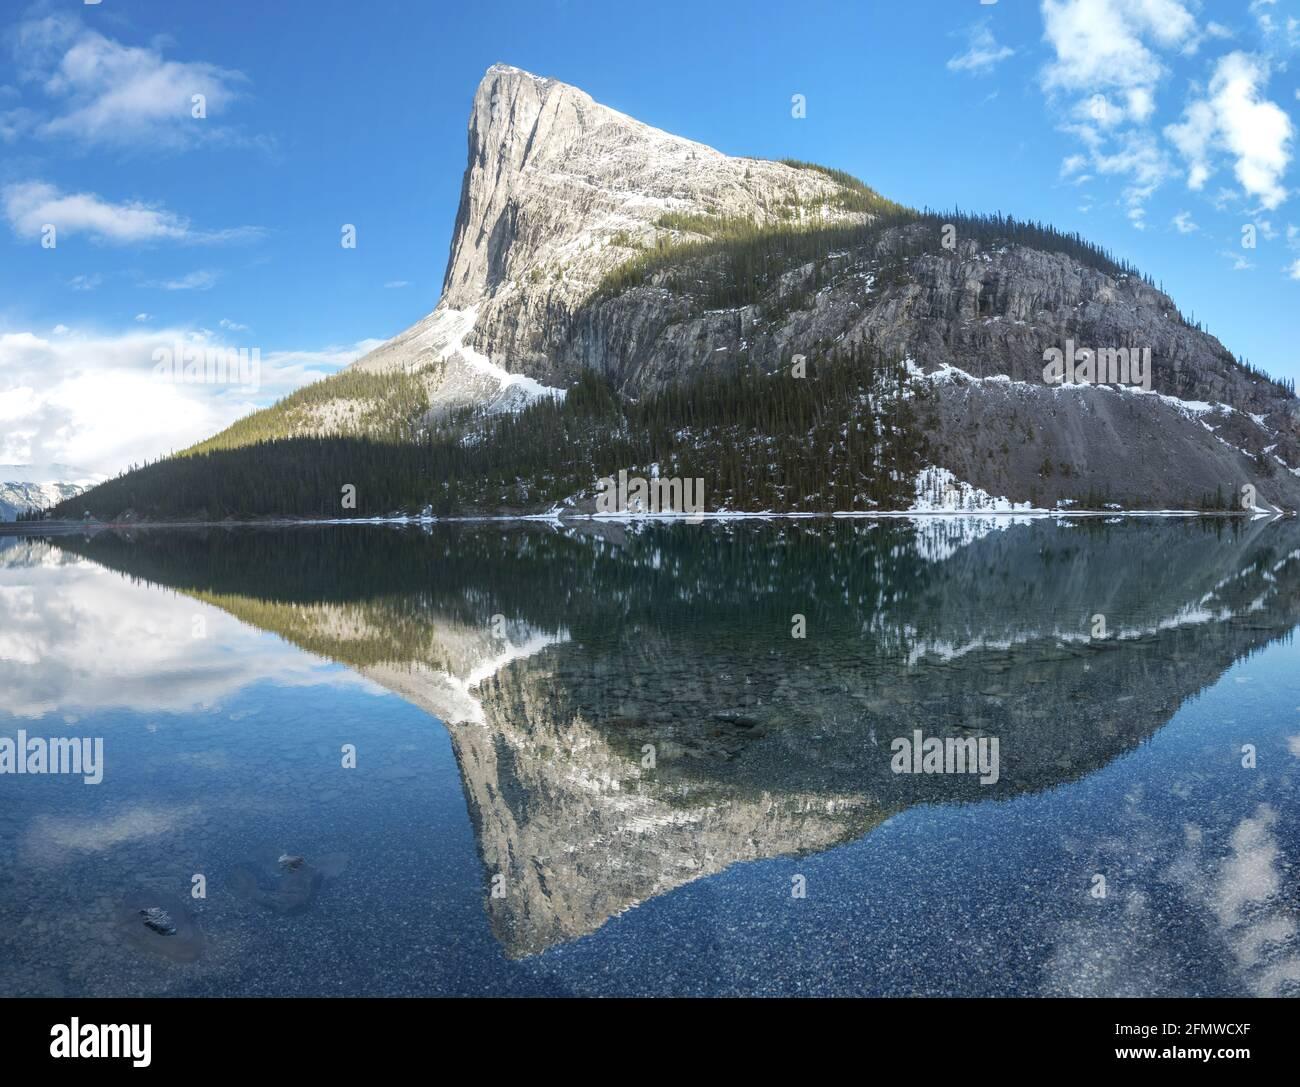 ha-ling-mountain-peak-reflected-in-calm-